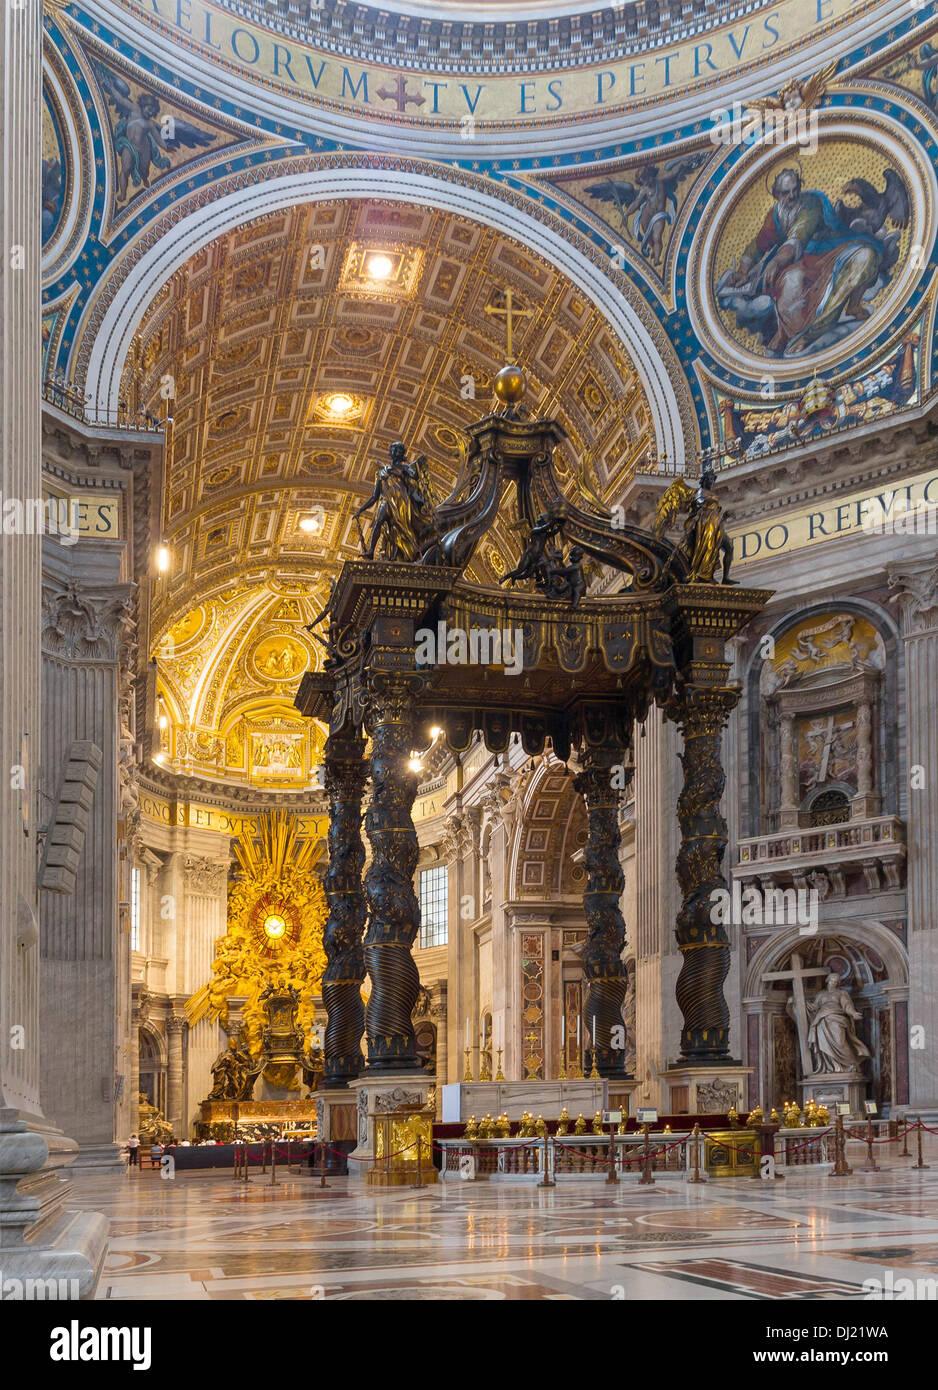 Baldachin by Bernini, altar and absid, Saint Peter's Basilica, Vatican City. - Stock Image